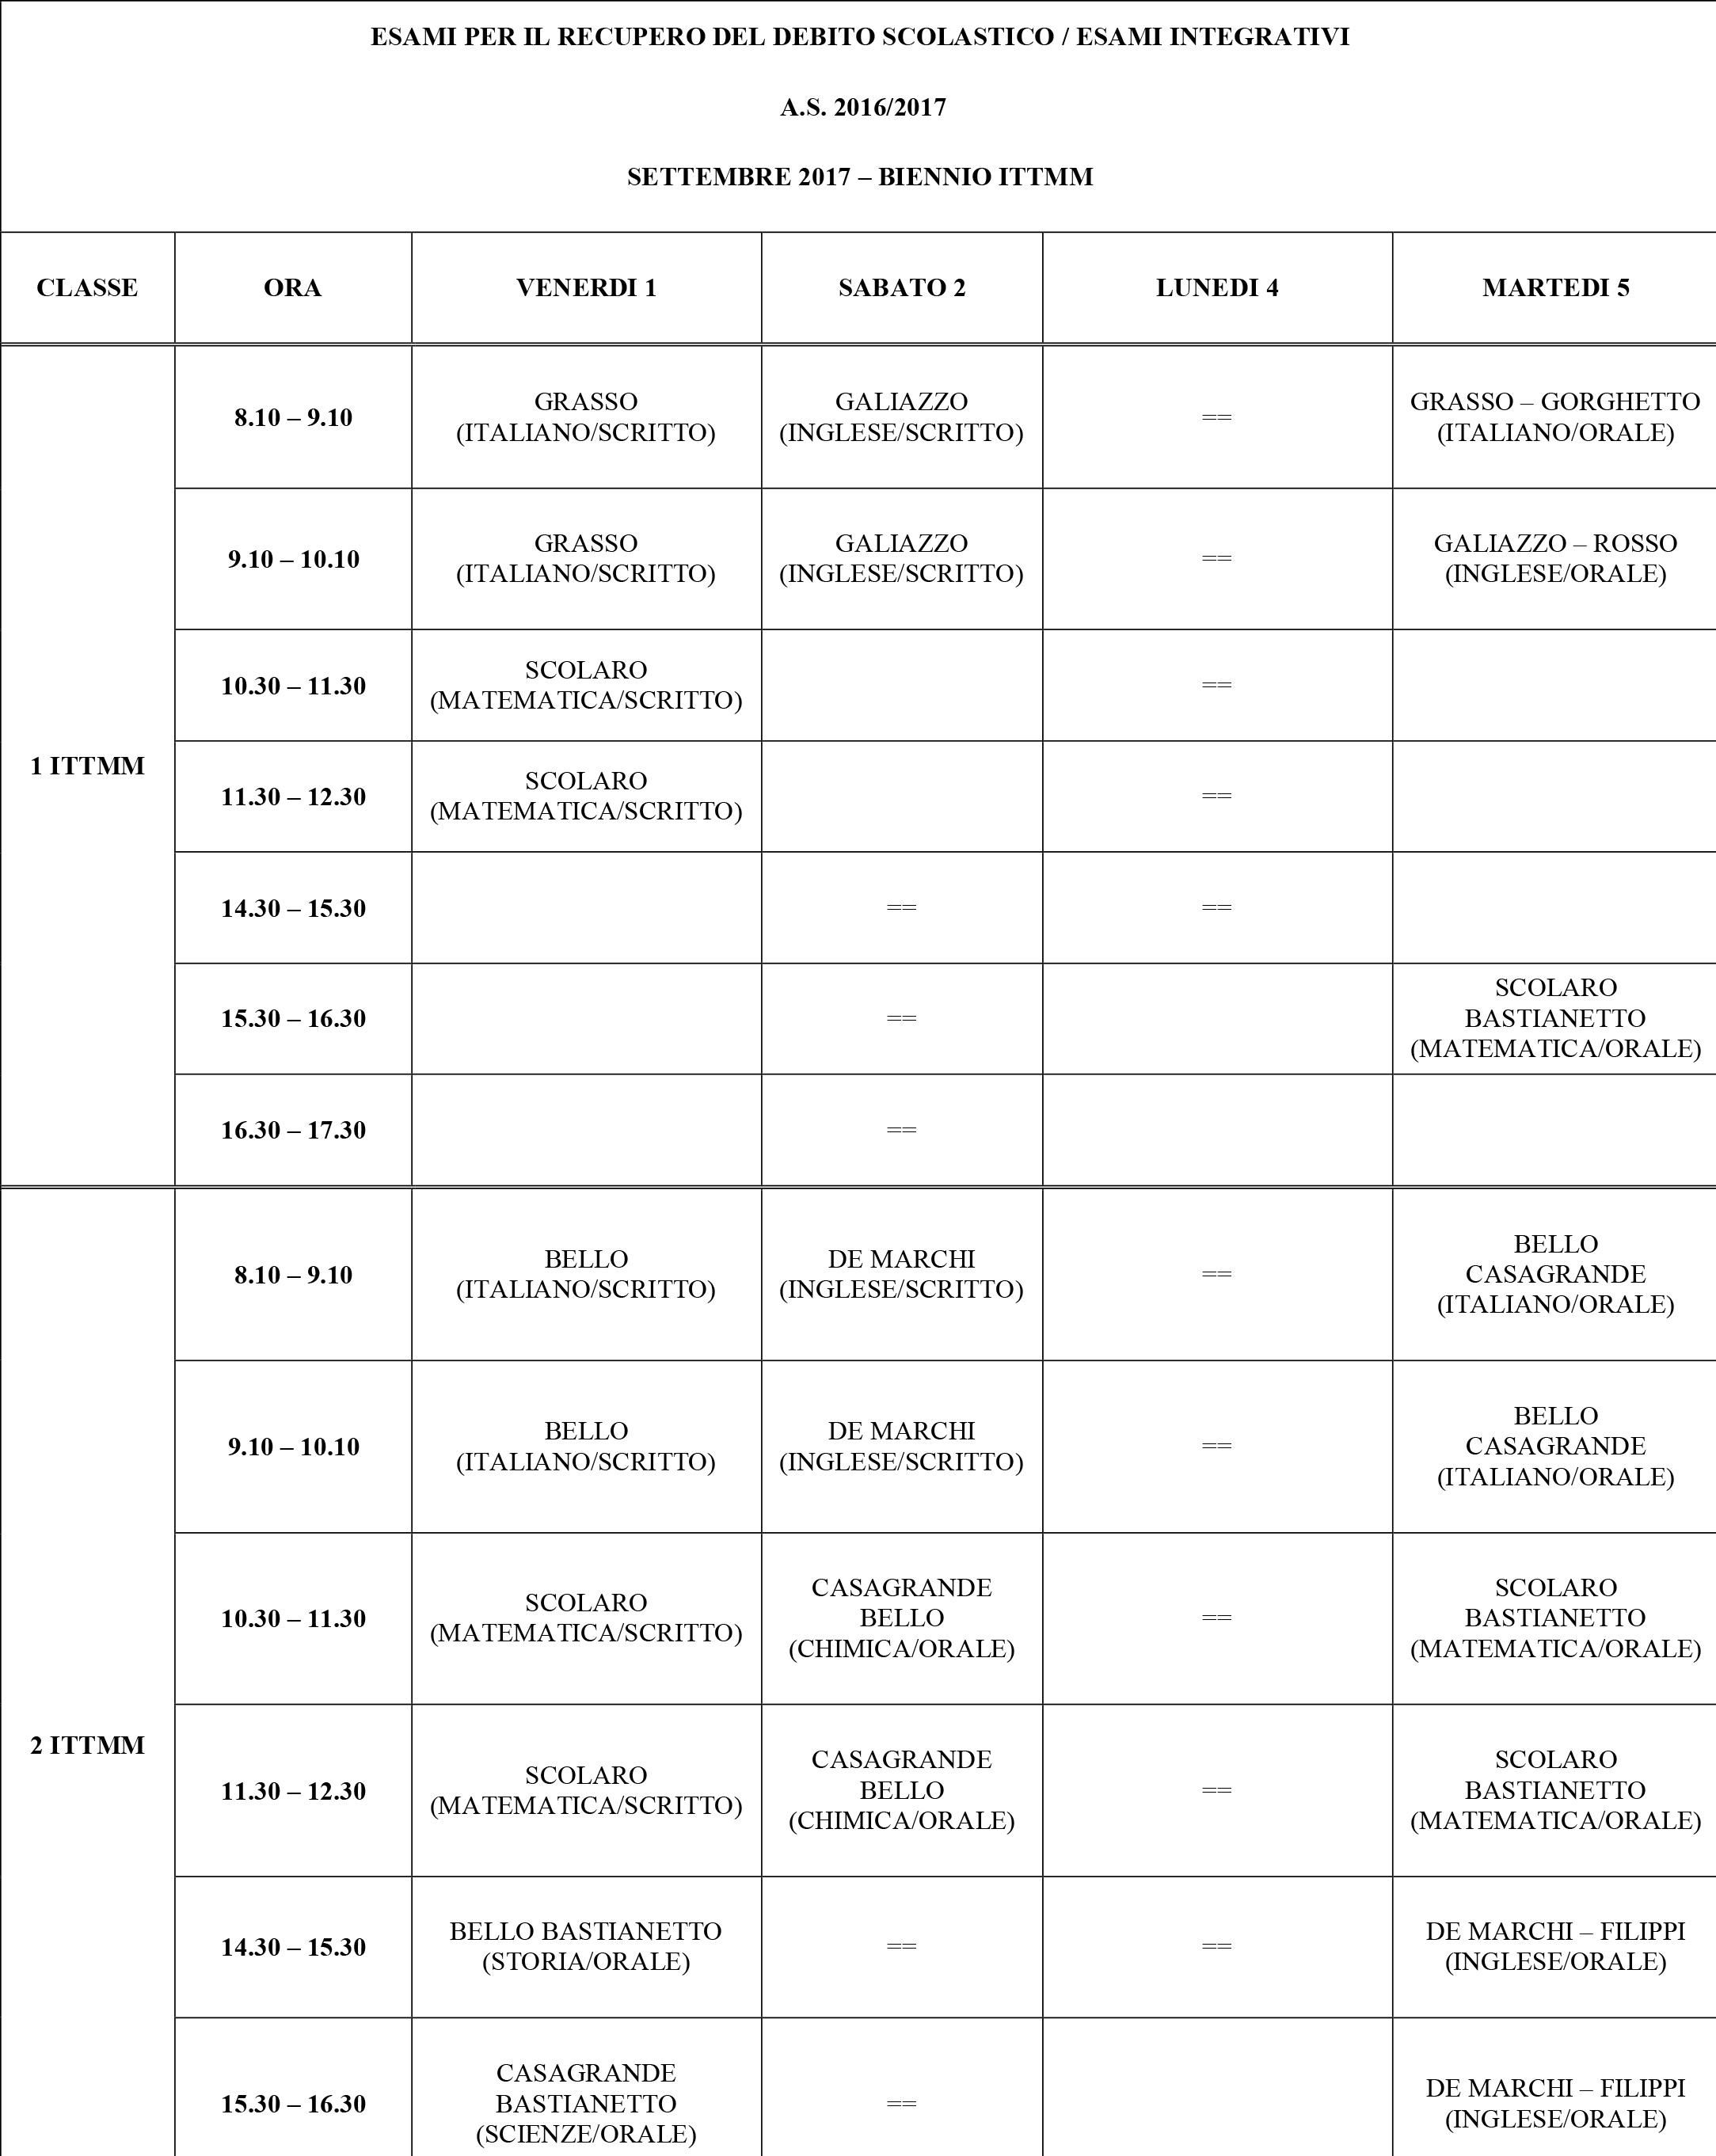 Calendario Esami.Calendario Esami Di Settembre Casa Religiosa Collegio